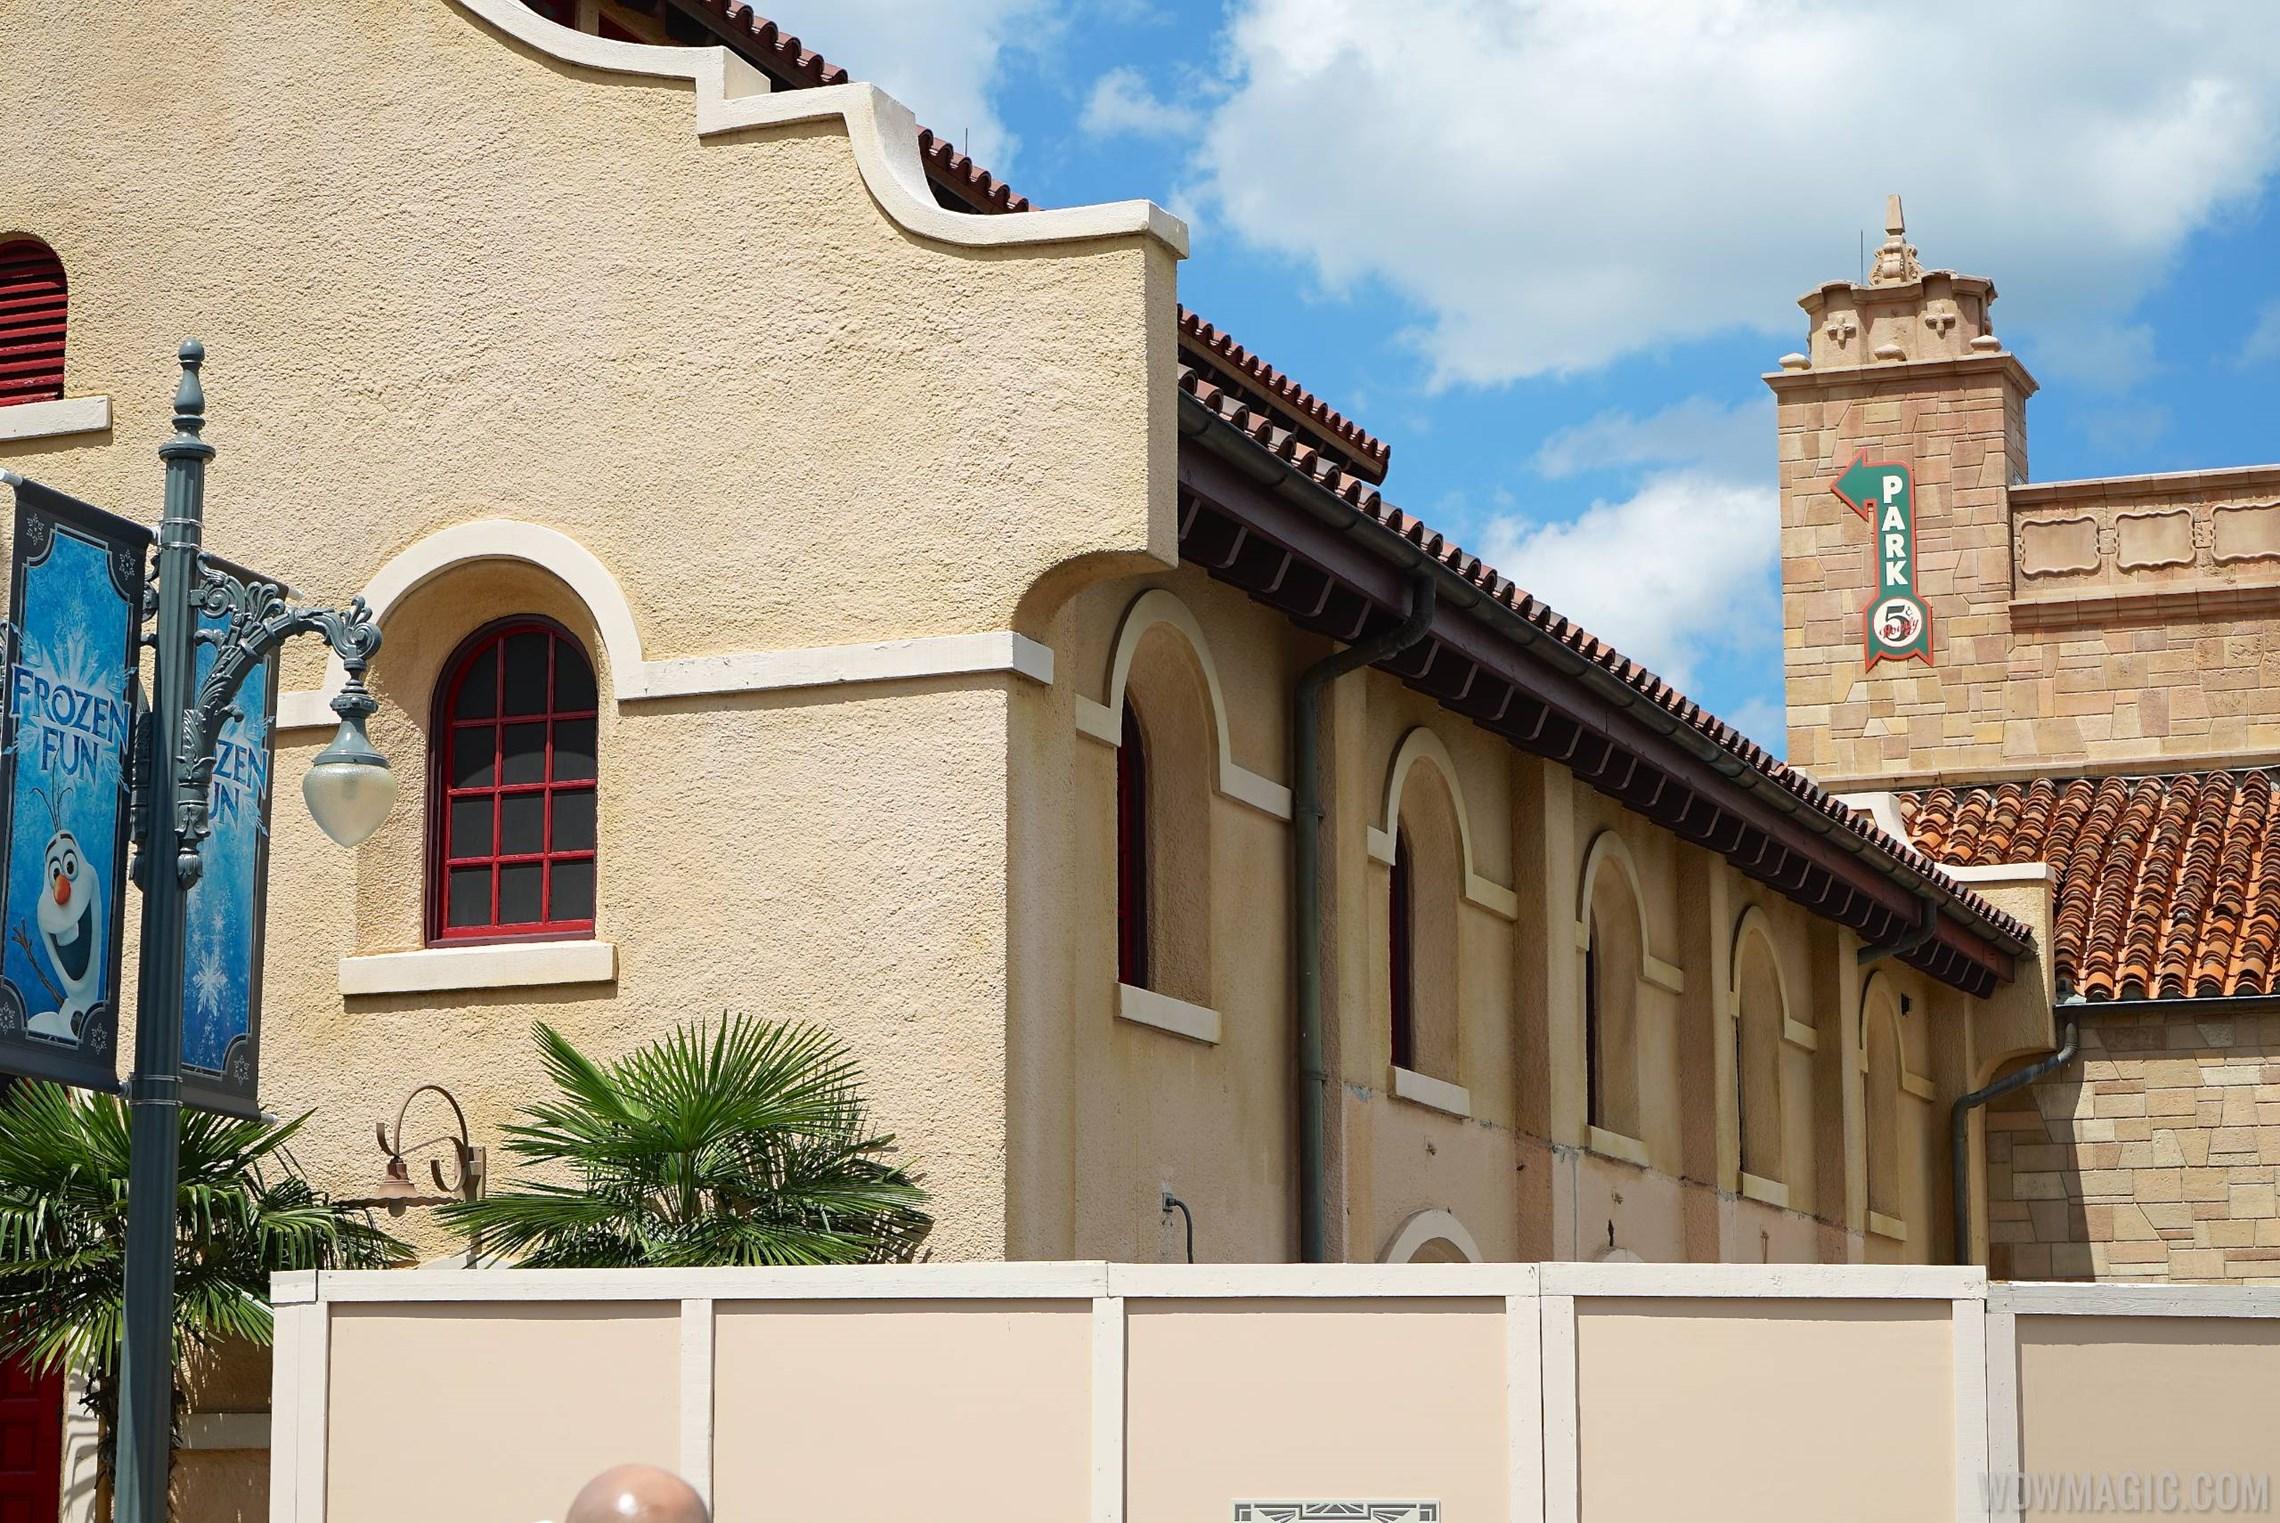 Starbucks Disney's Hollywood Studios construction